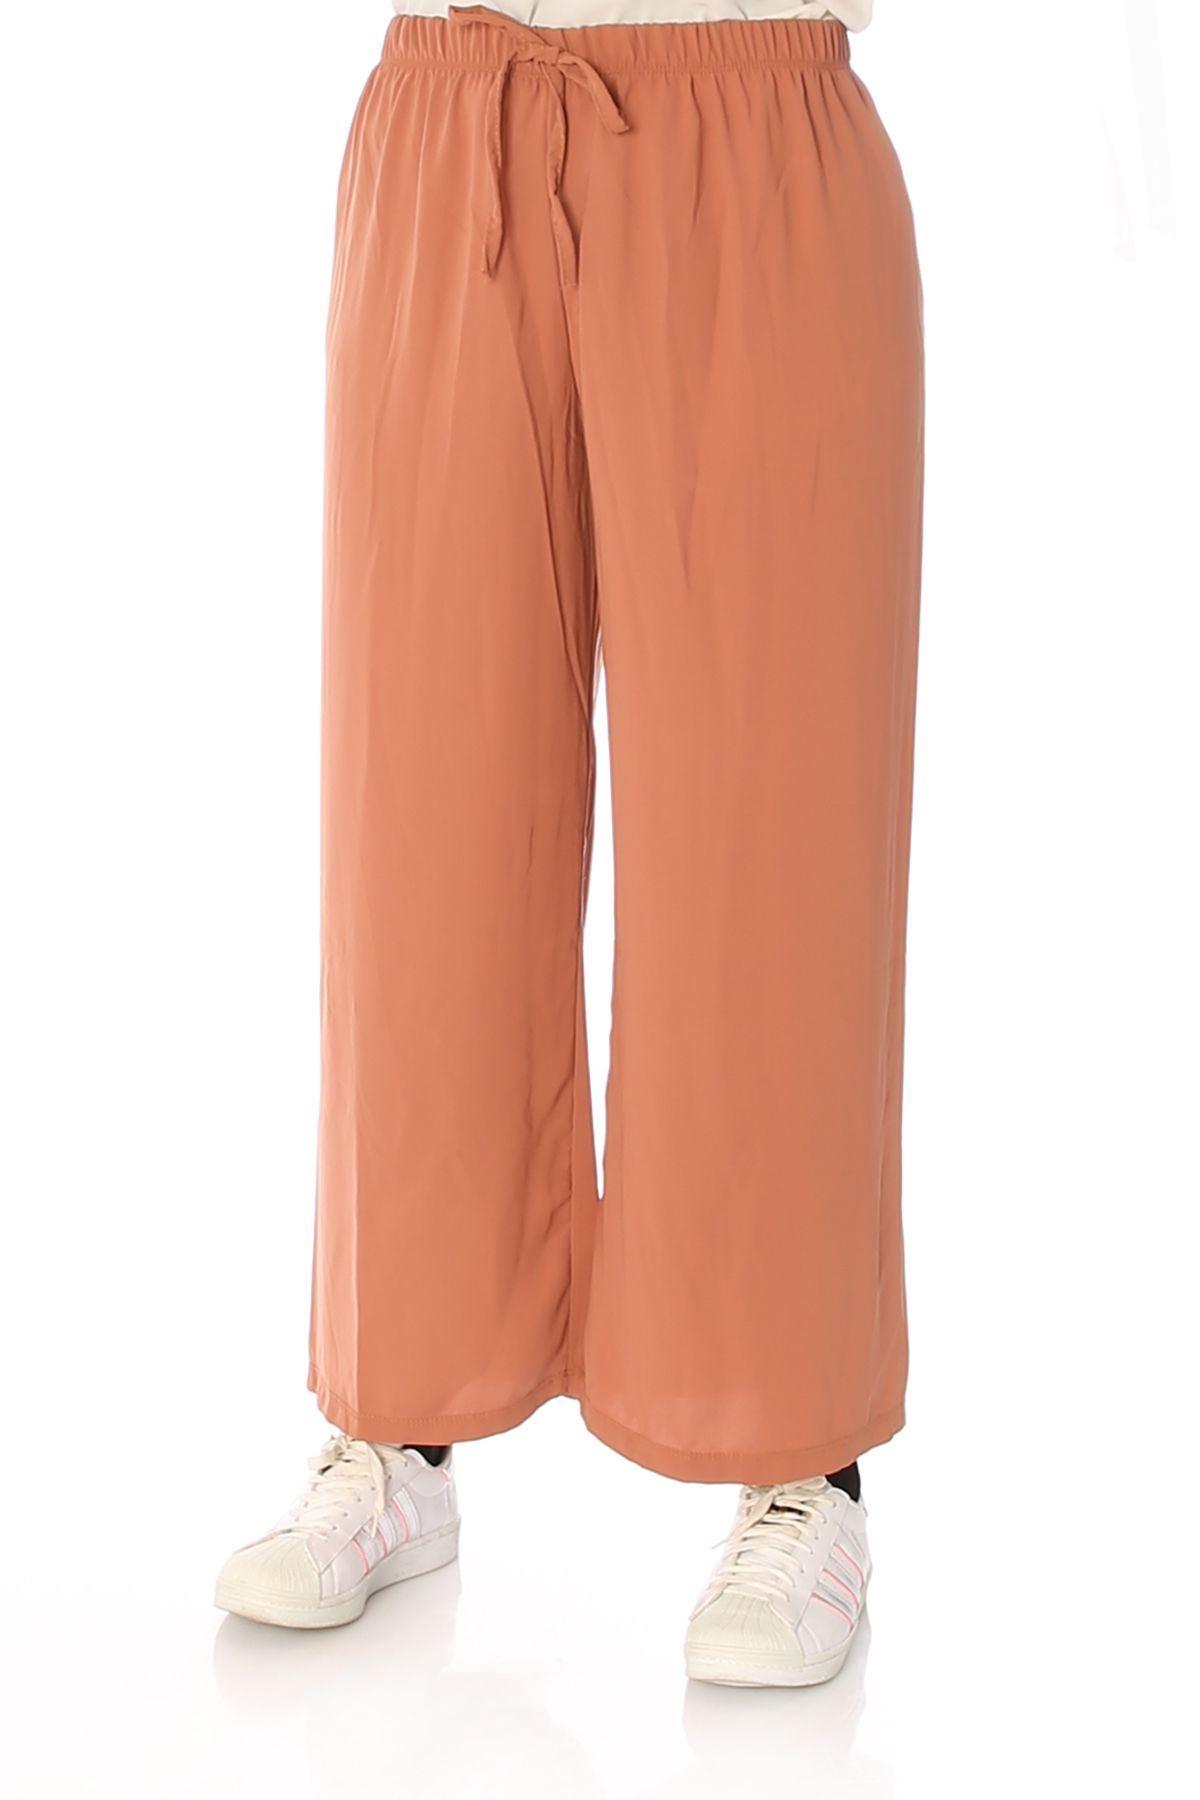 Bel Lastikli Salaş Pantolon-Karamel